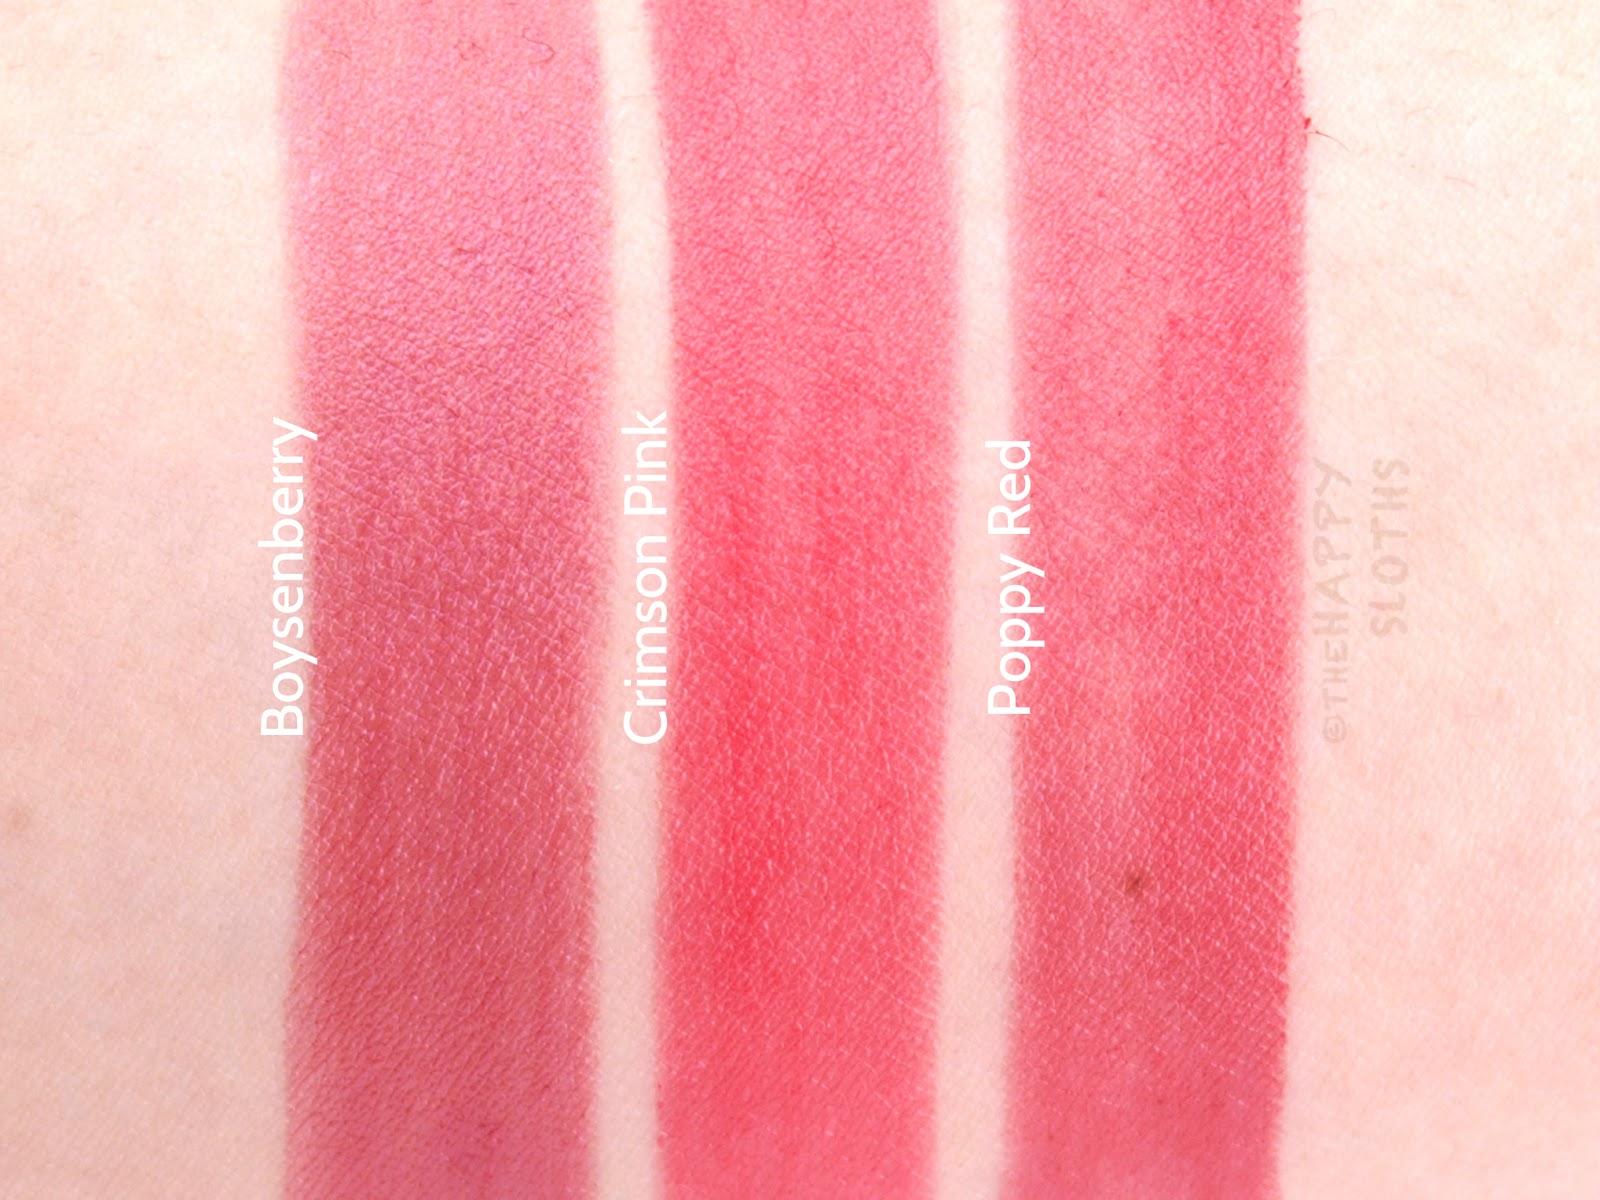 Burberry Kisses Sheer Lipstick In Quot No 289 Boysenberry Quot Quot No 241 Crimson Pink Quot Amp Quot No 309 Poppy